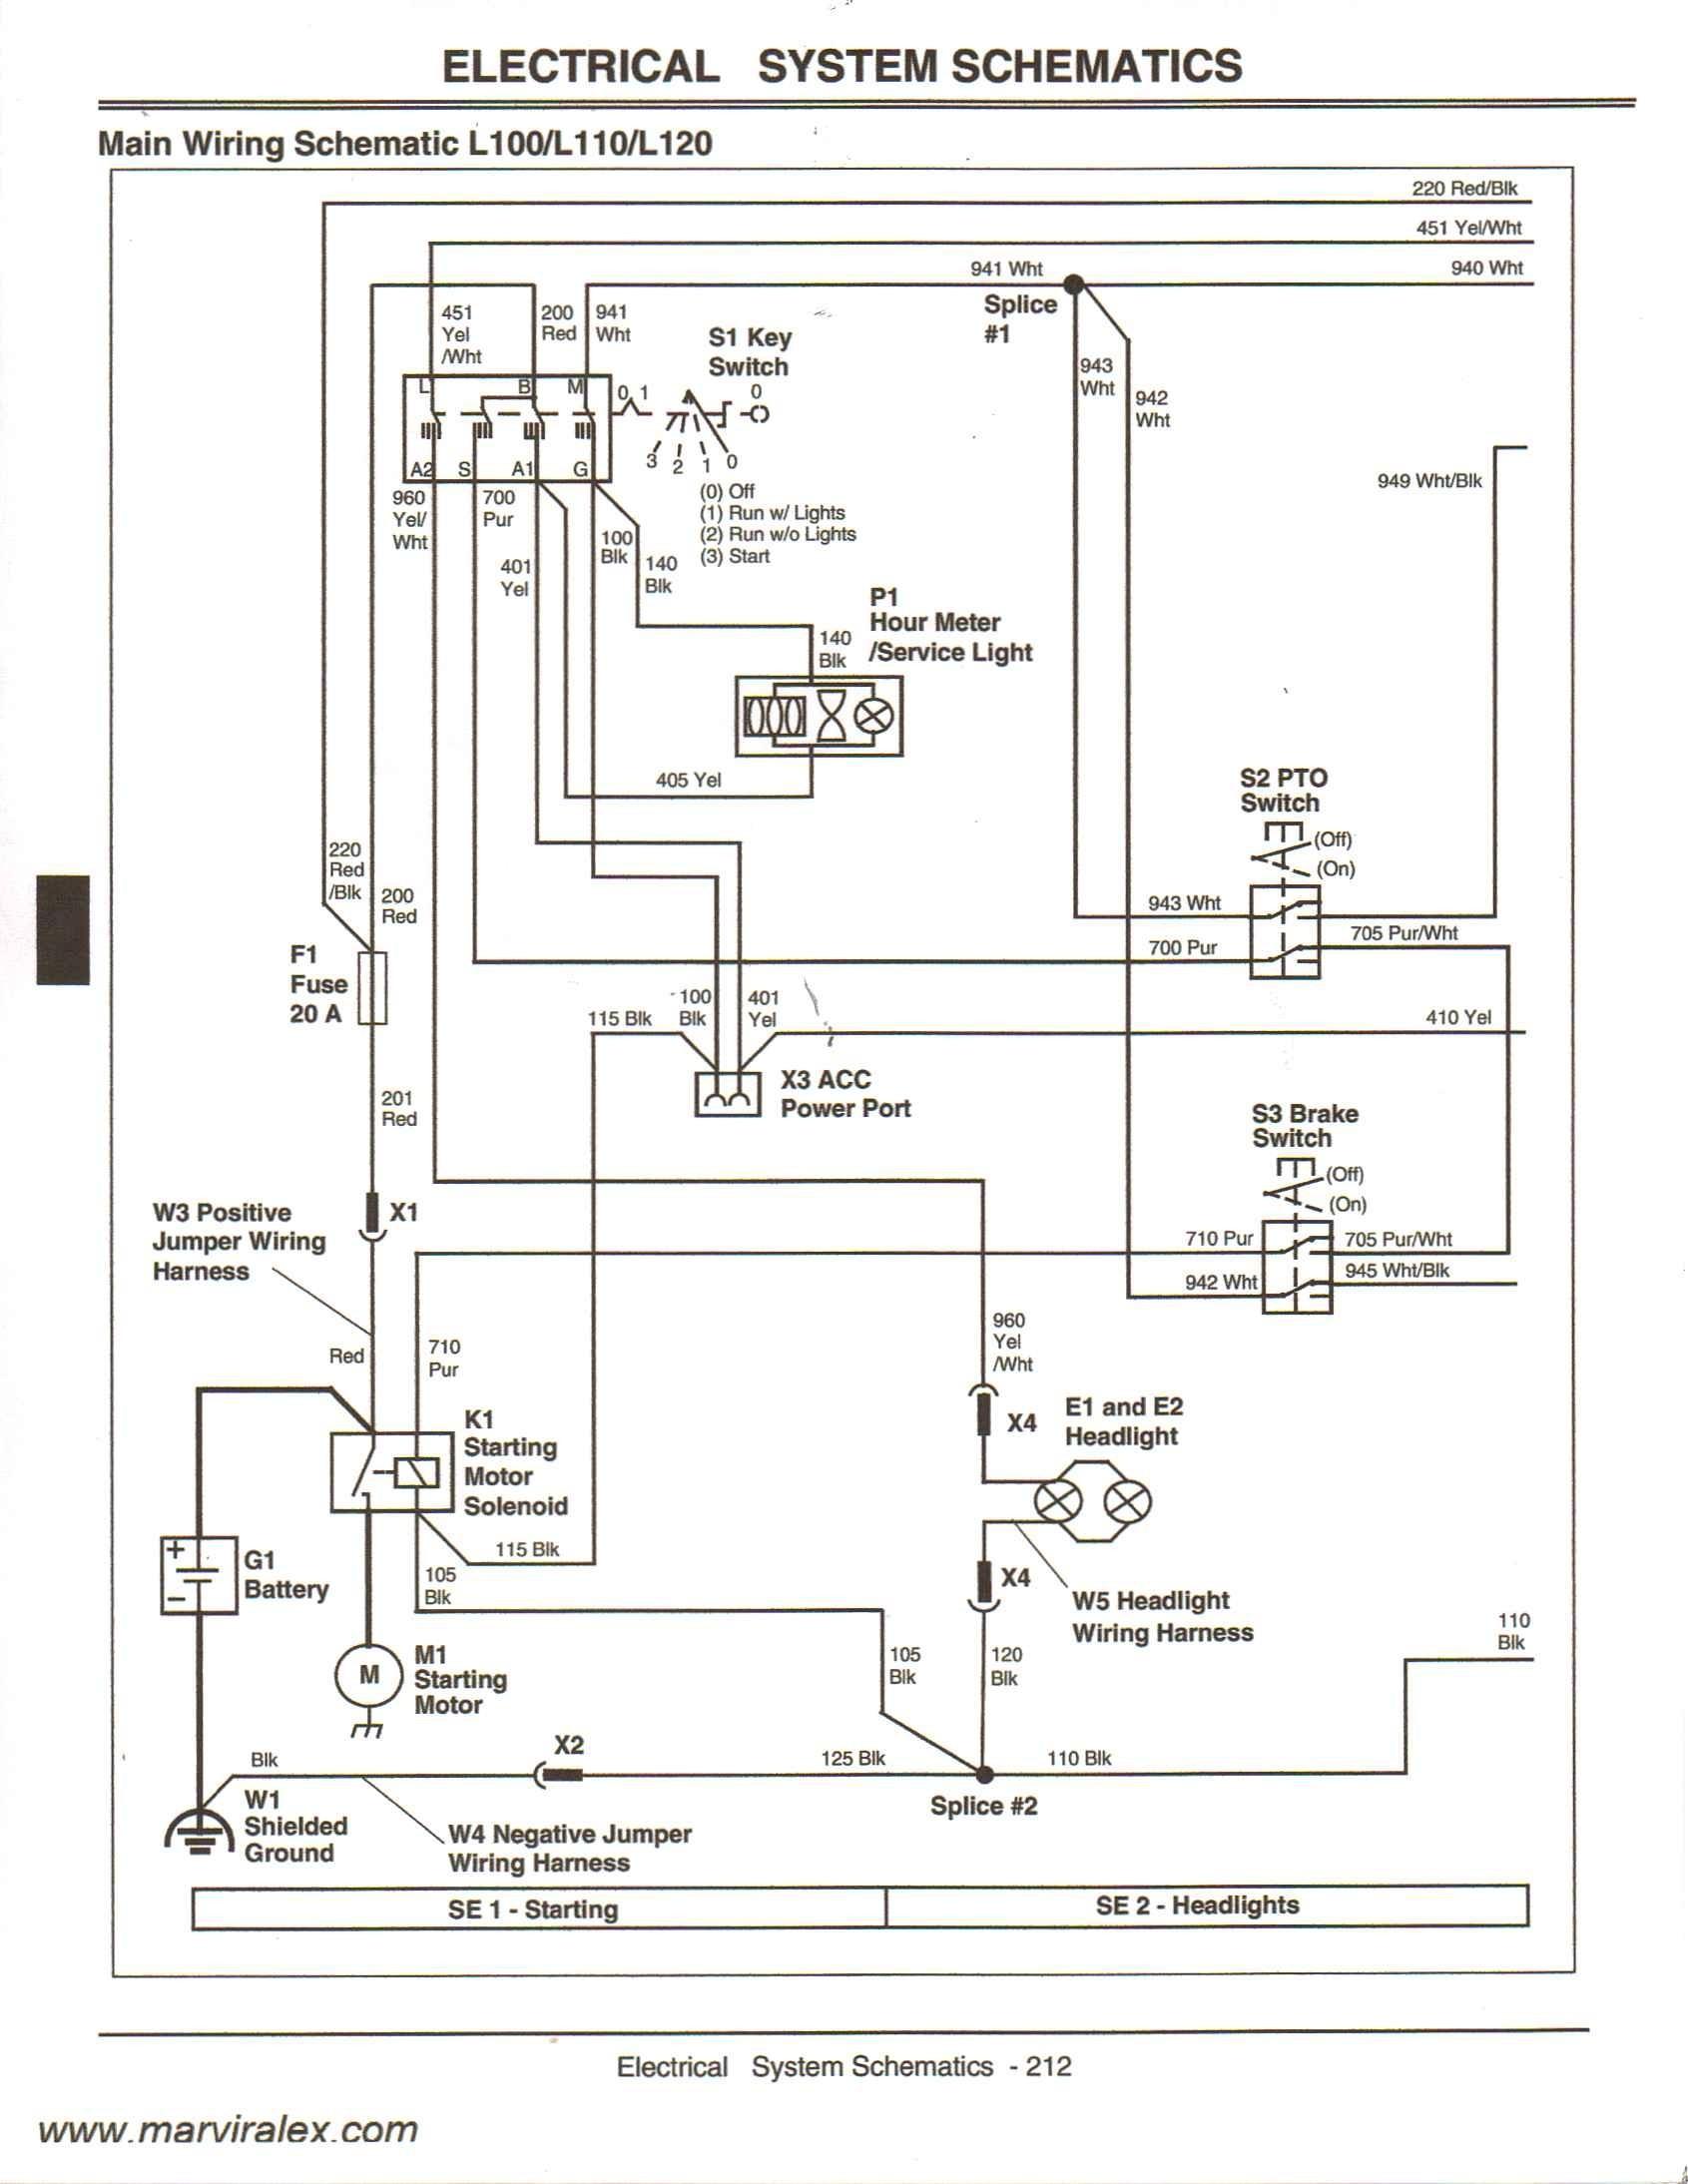 john deere gator 4x2 wiring diagram unique john deere wiring diagram pto ignition switch electrical 318 of john deere gator 4x2 wiring diagram